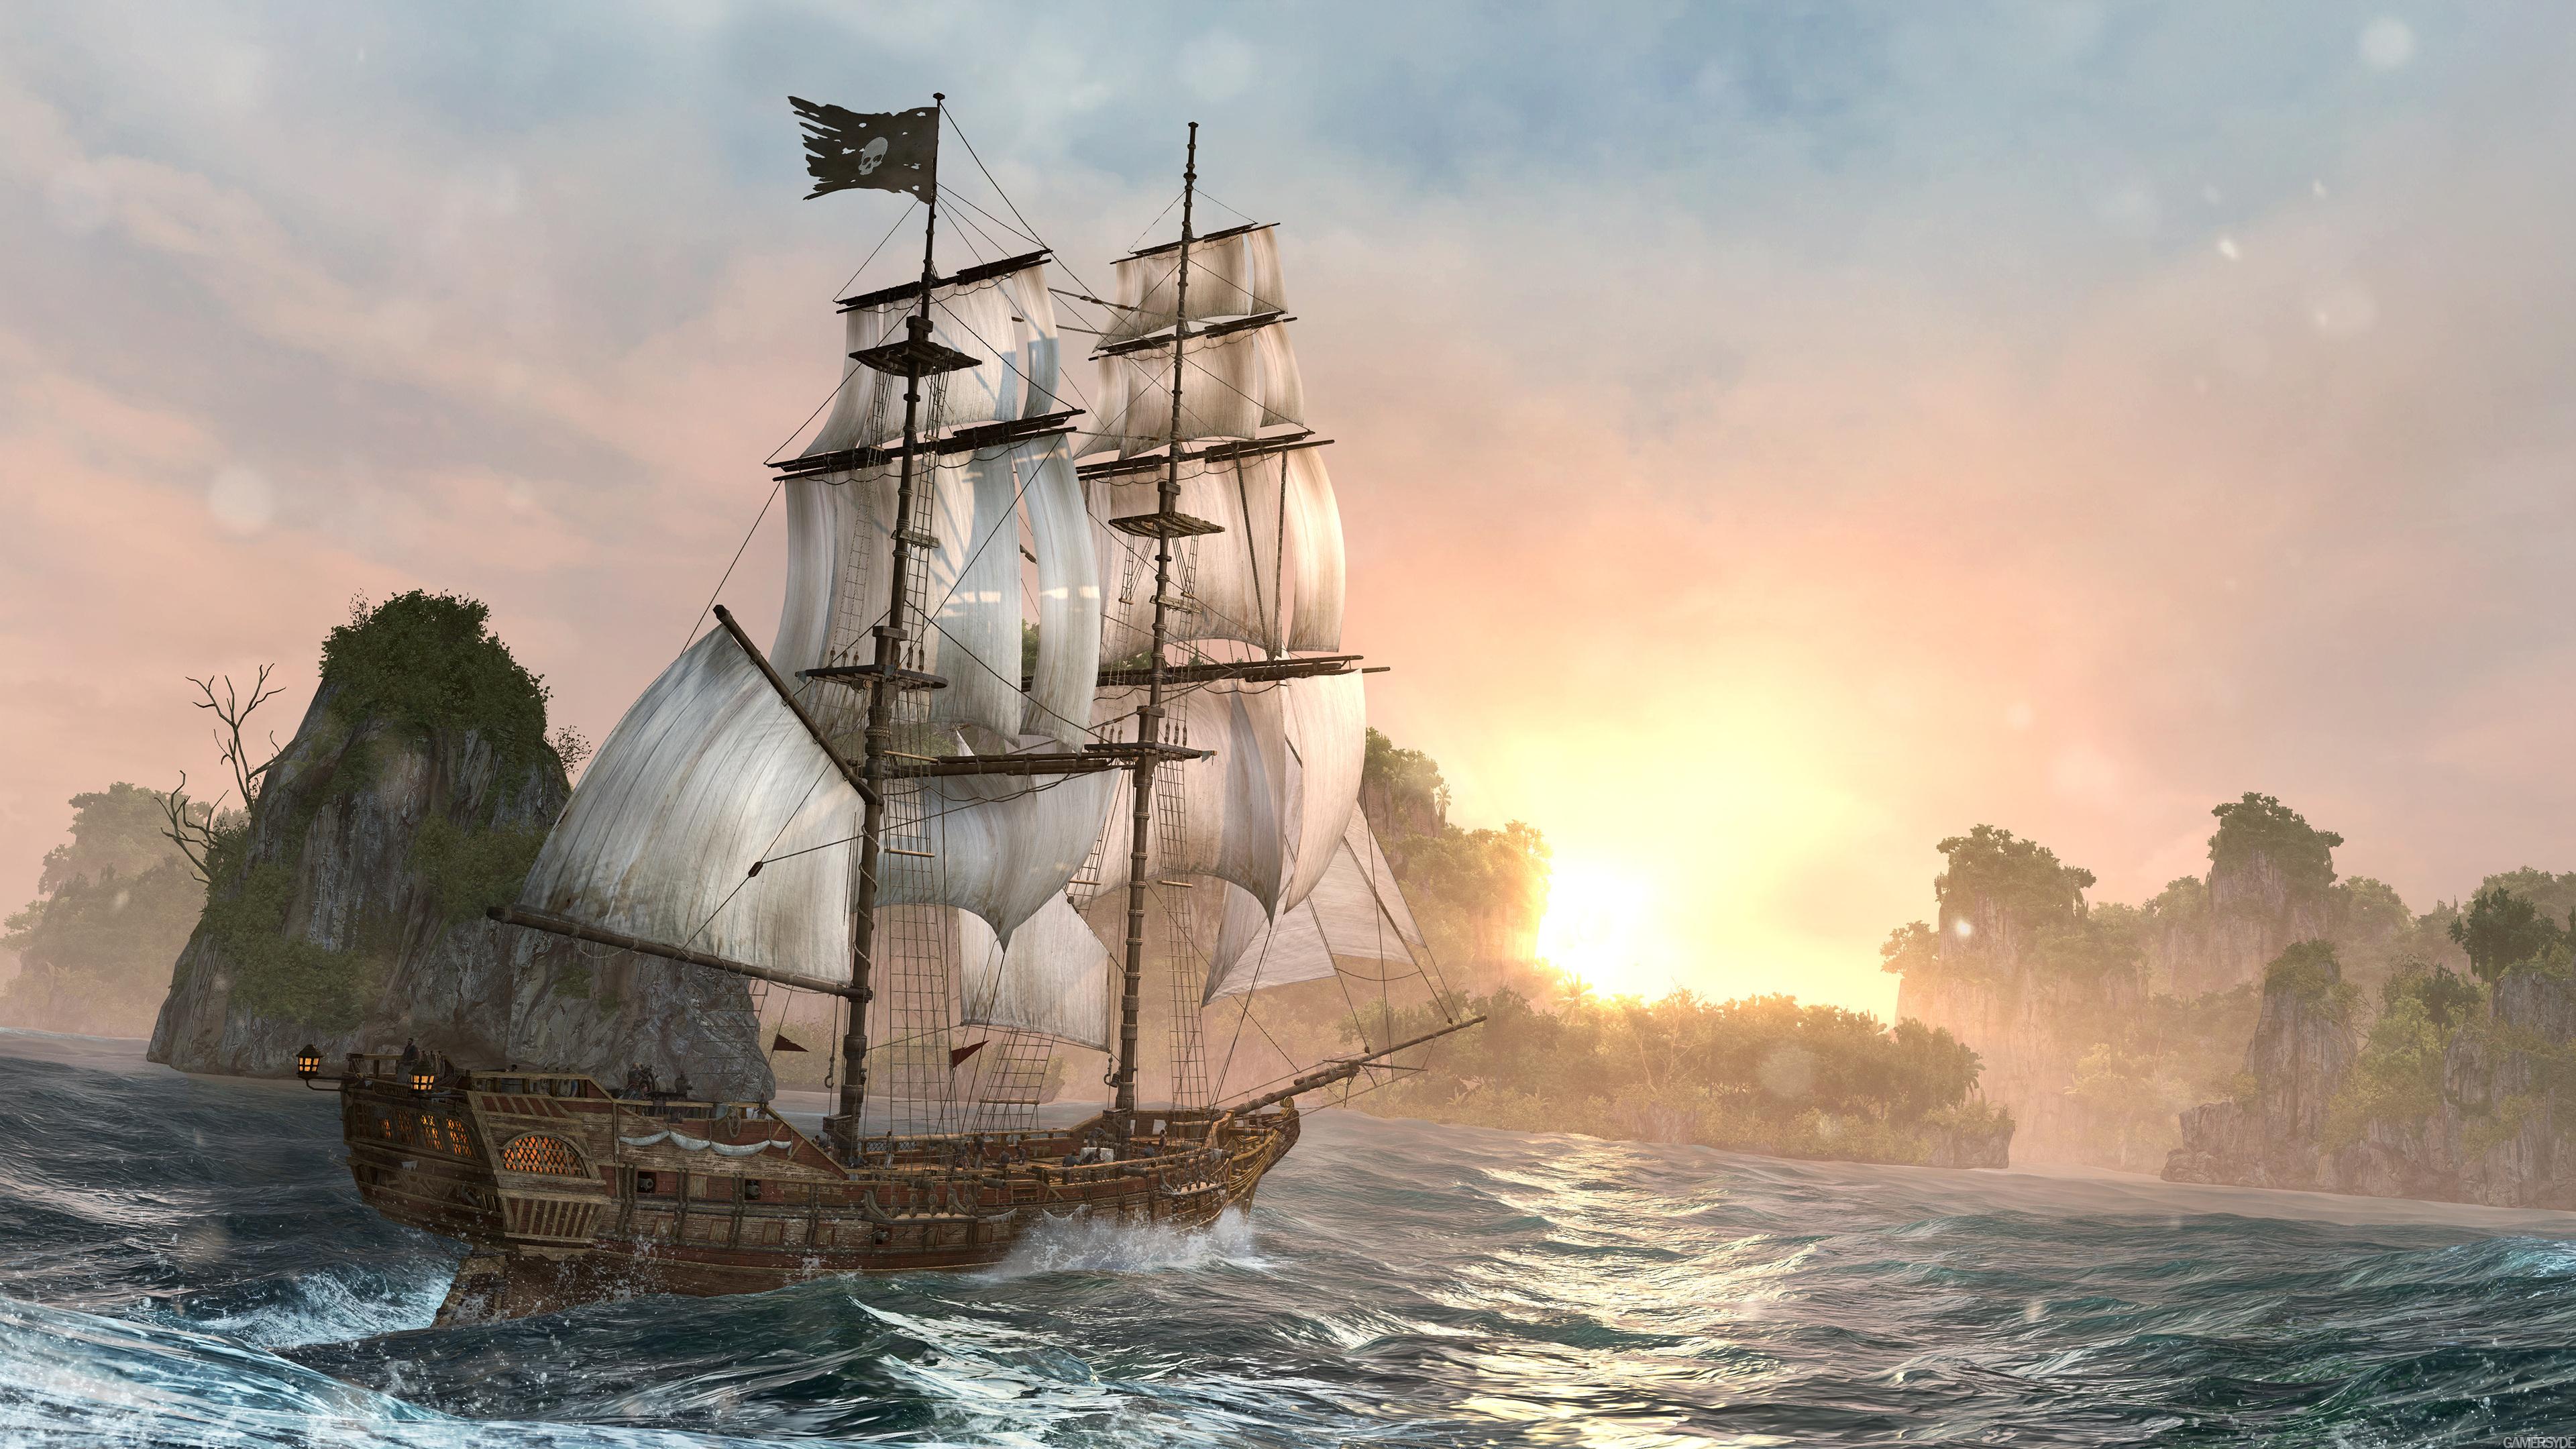 IV video game ship river hd sunrise ultrahd 4k wallpaper wallpaper 3840x2160